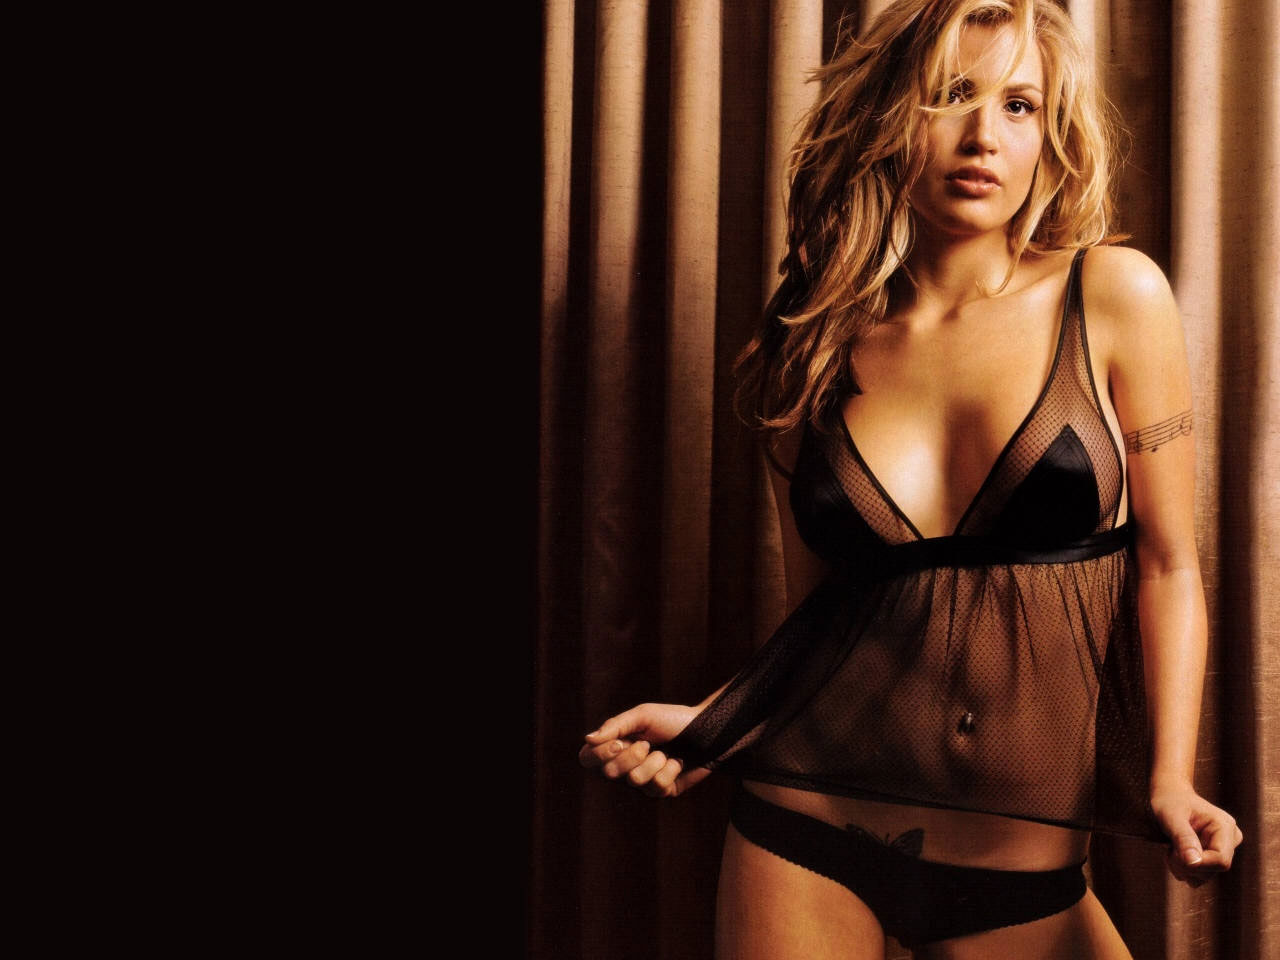 http://3.bp.blogspot.com/-RmueI9RFCn4/TZGcR33cWKI/AAAAAAAAMek/IBGI4u30ONQ/s1600/american%2Bbeauty%2BWilla%2BFord%2Bwallpapers.jpg